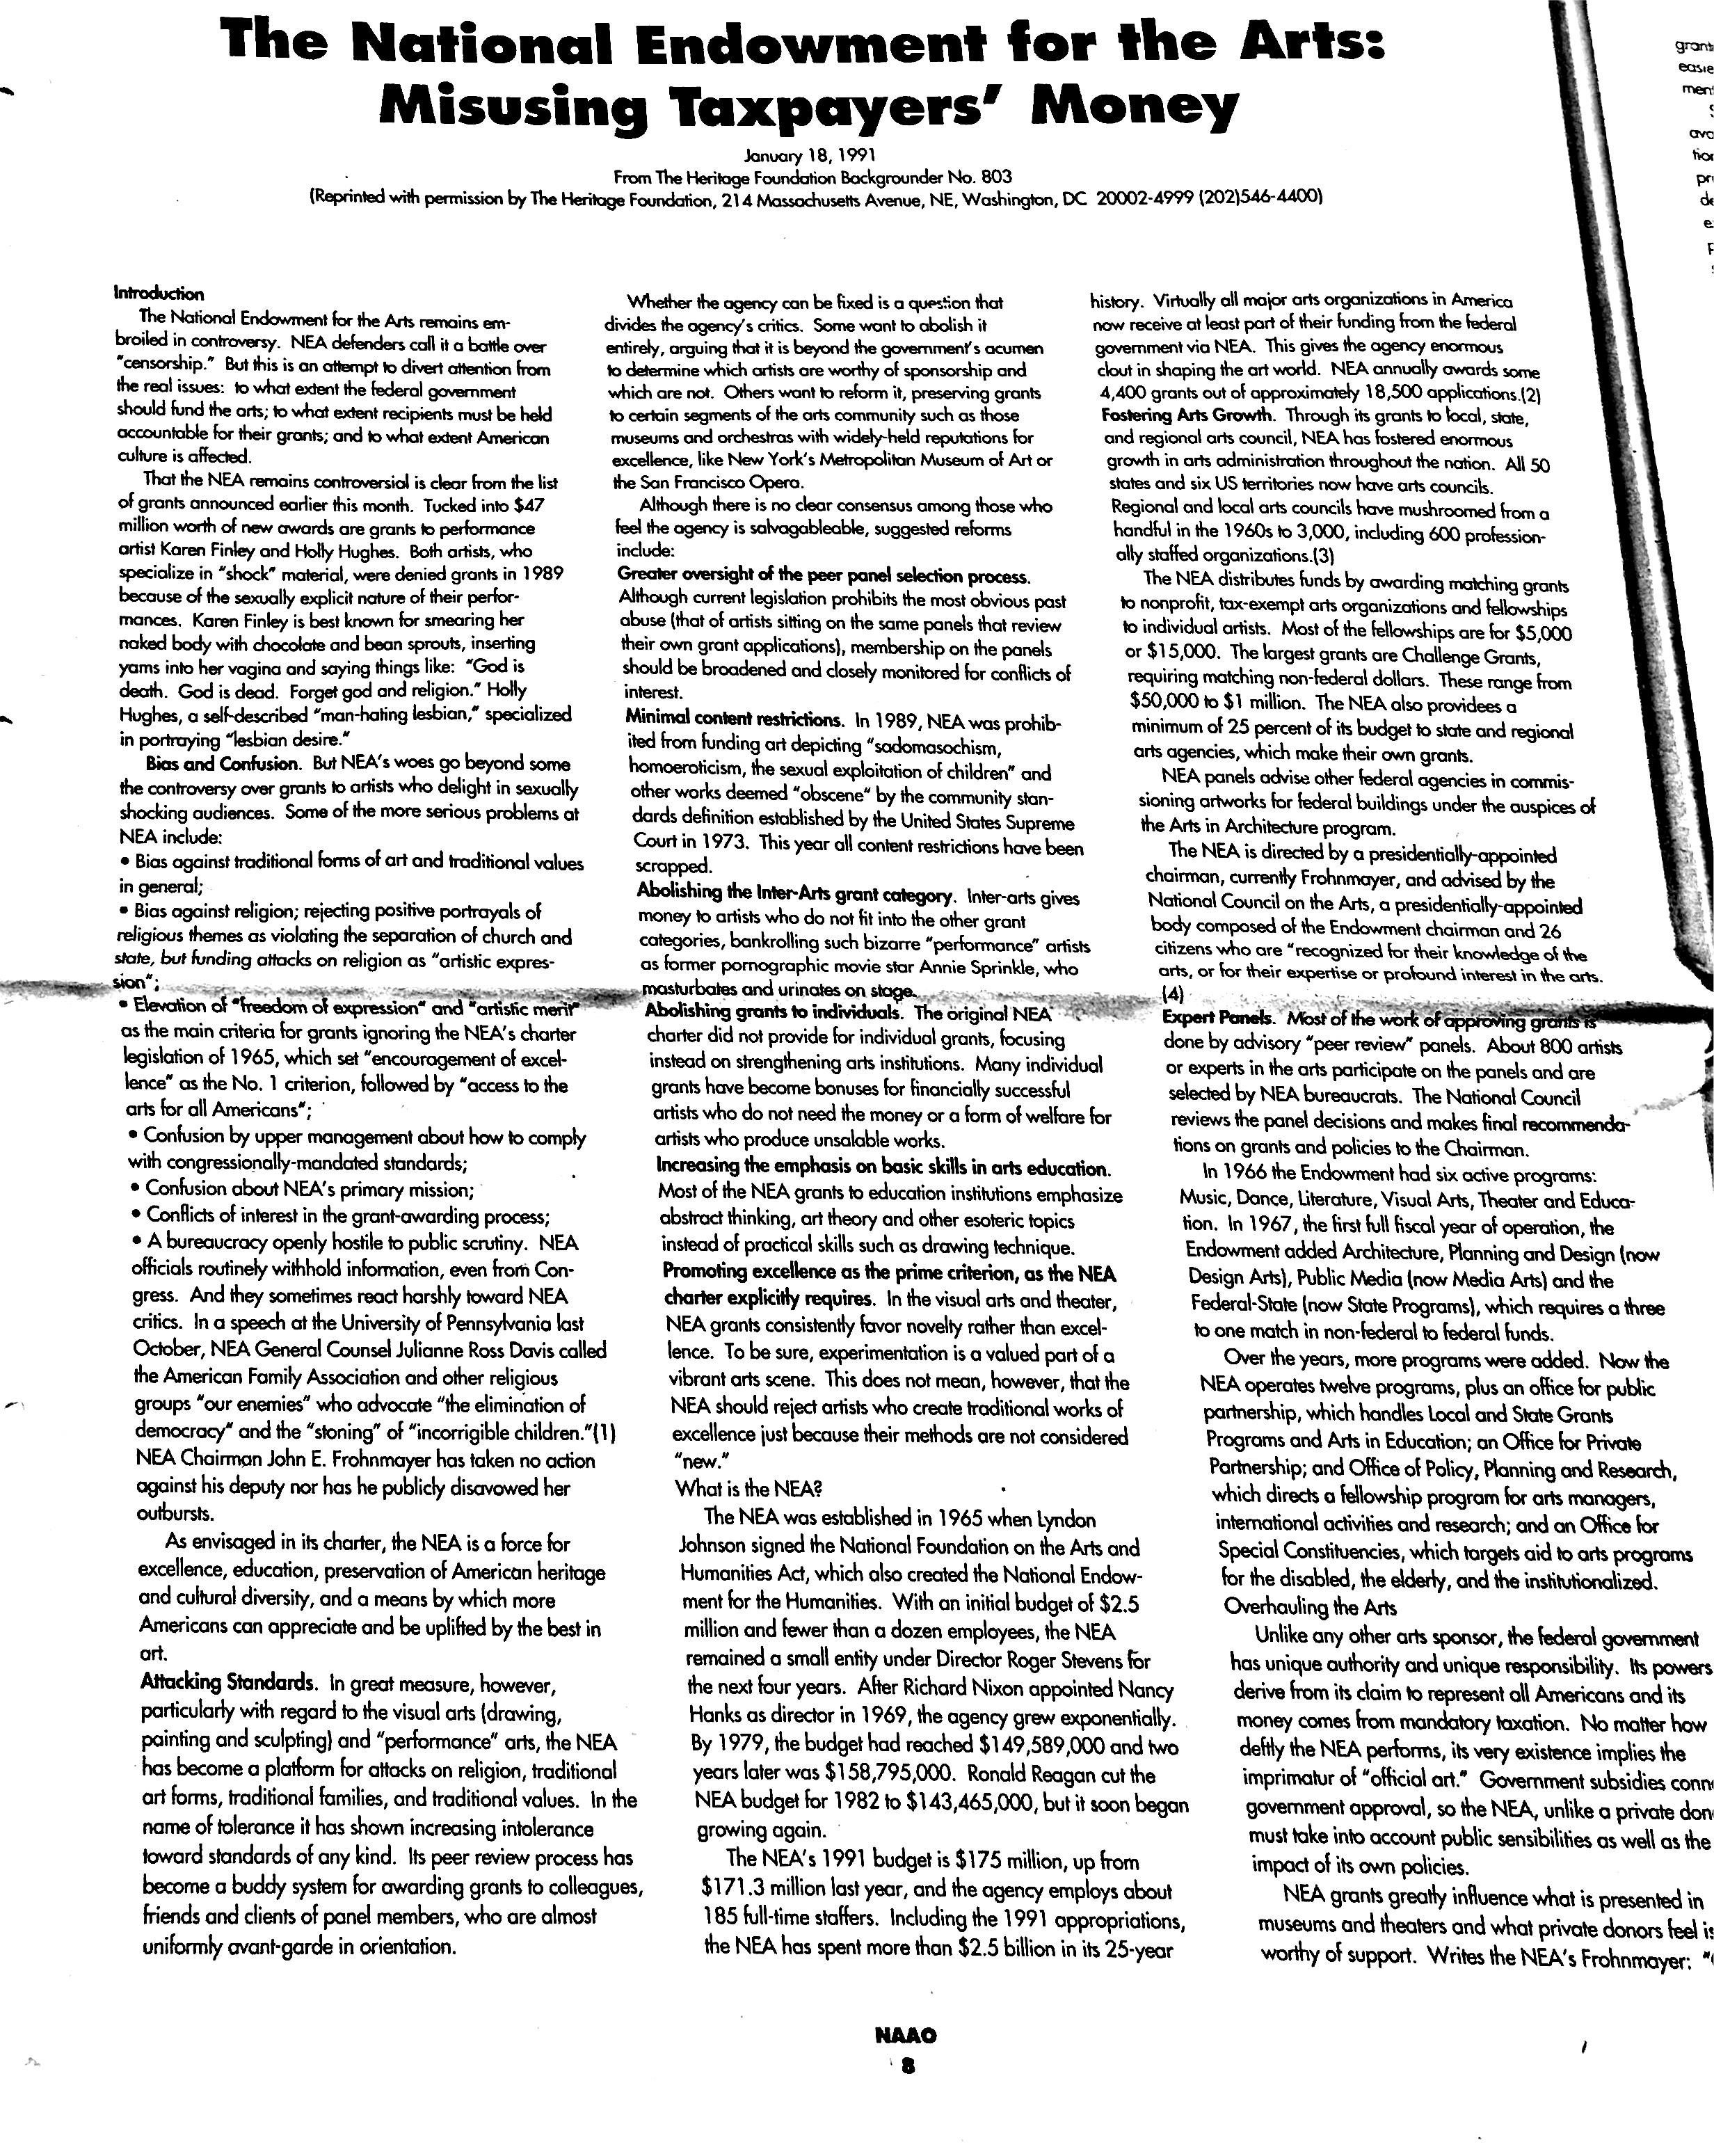 January 1991 - NAAO Bulletin Page 8.jpg